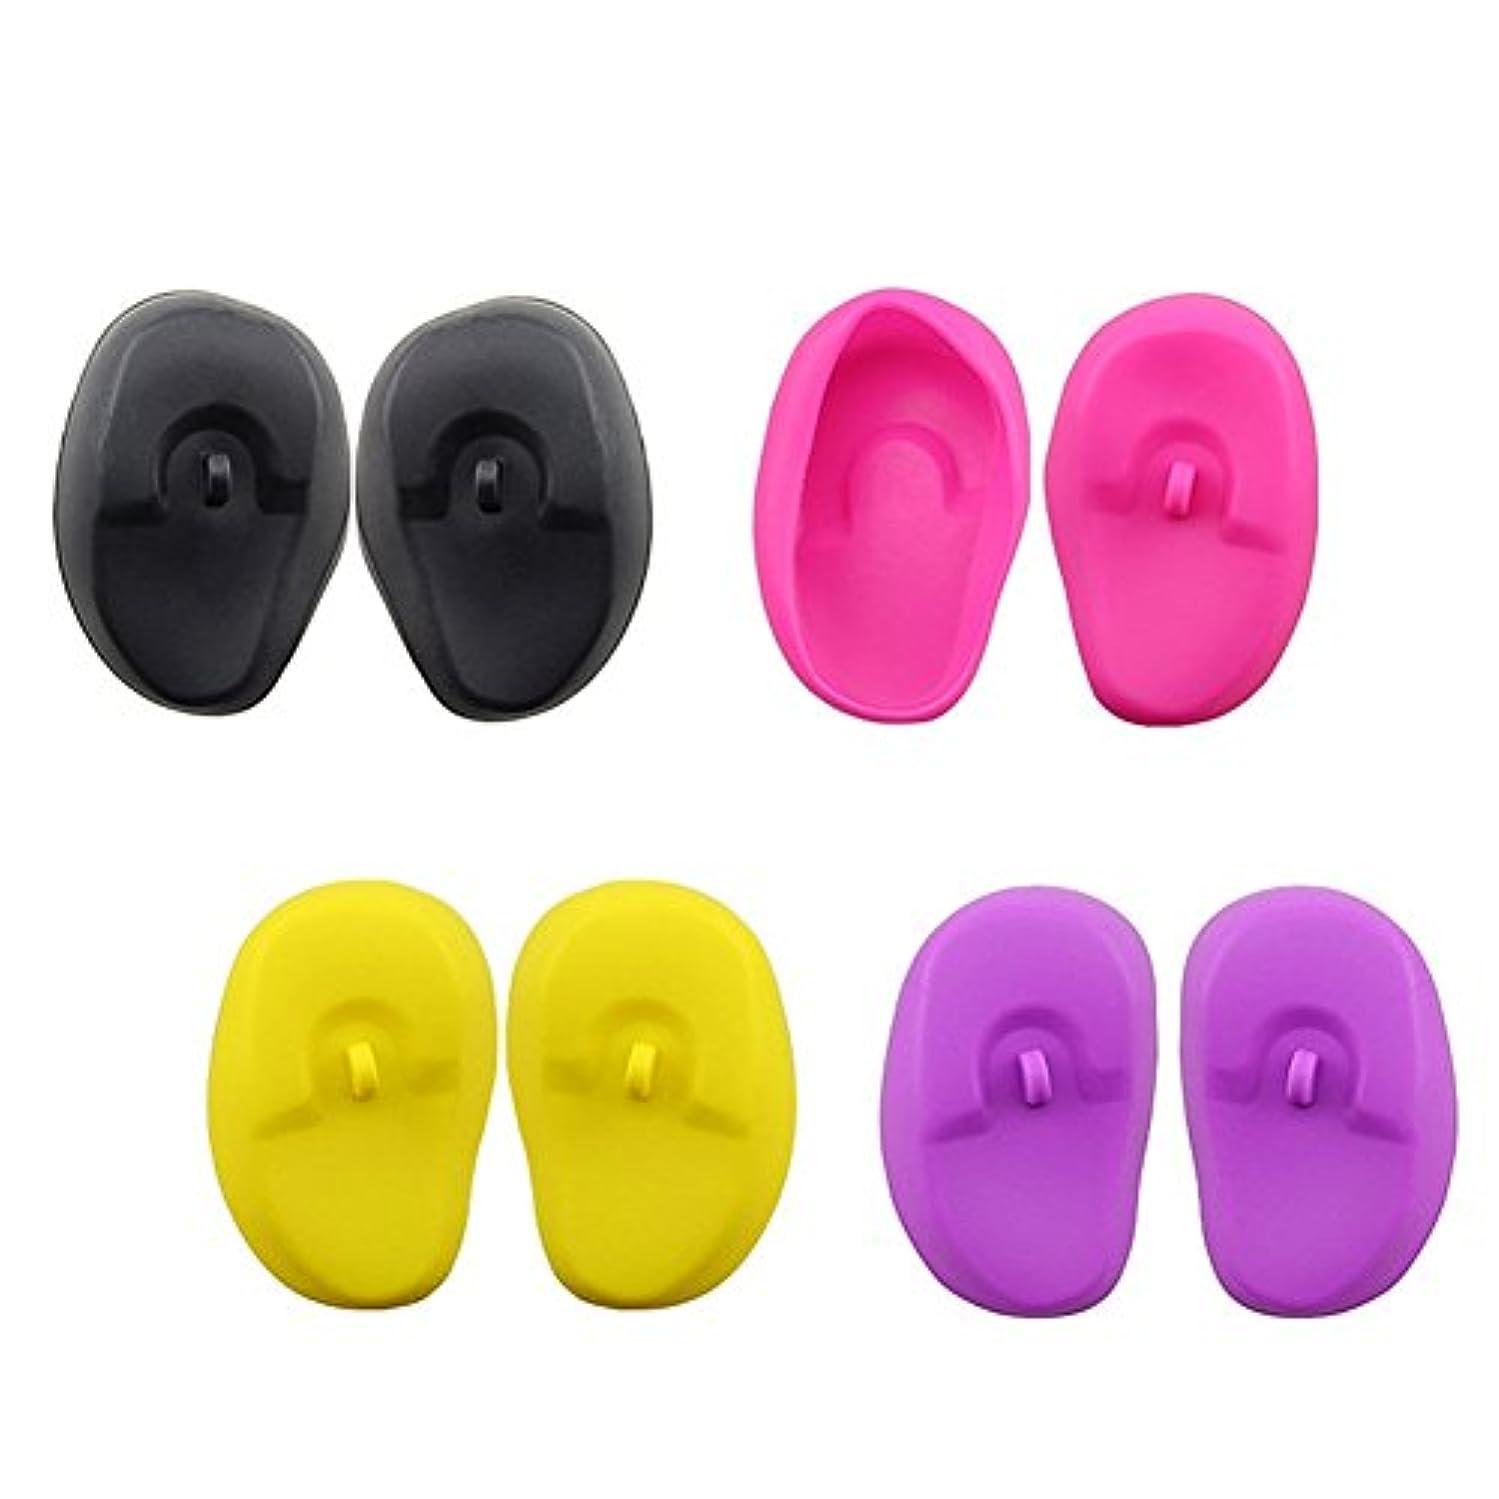 TerGOOSE 耳カバー 防水 イヤーカバー プロ 毛染め 汚れ 防止 アイロン コテ 火傷 保護 シリコン製 お風呂 左右 2個 セット 全4色 ランダムな色